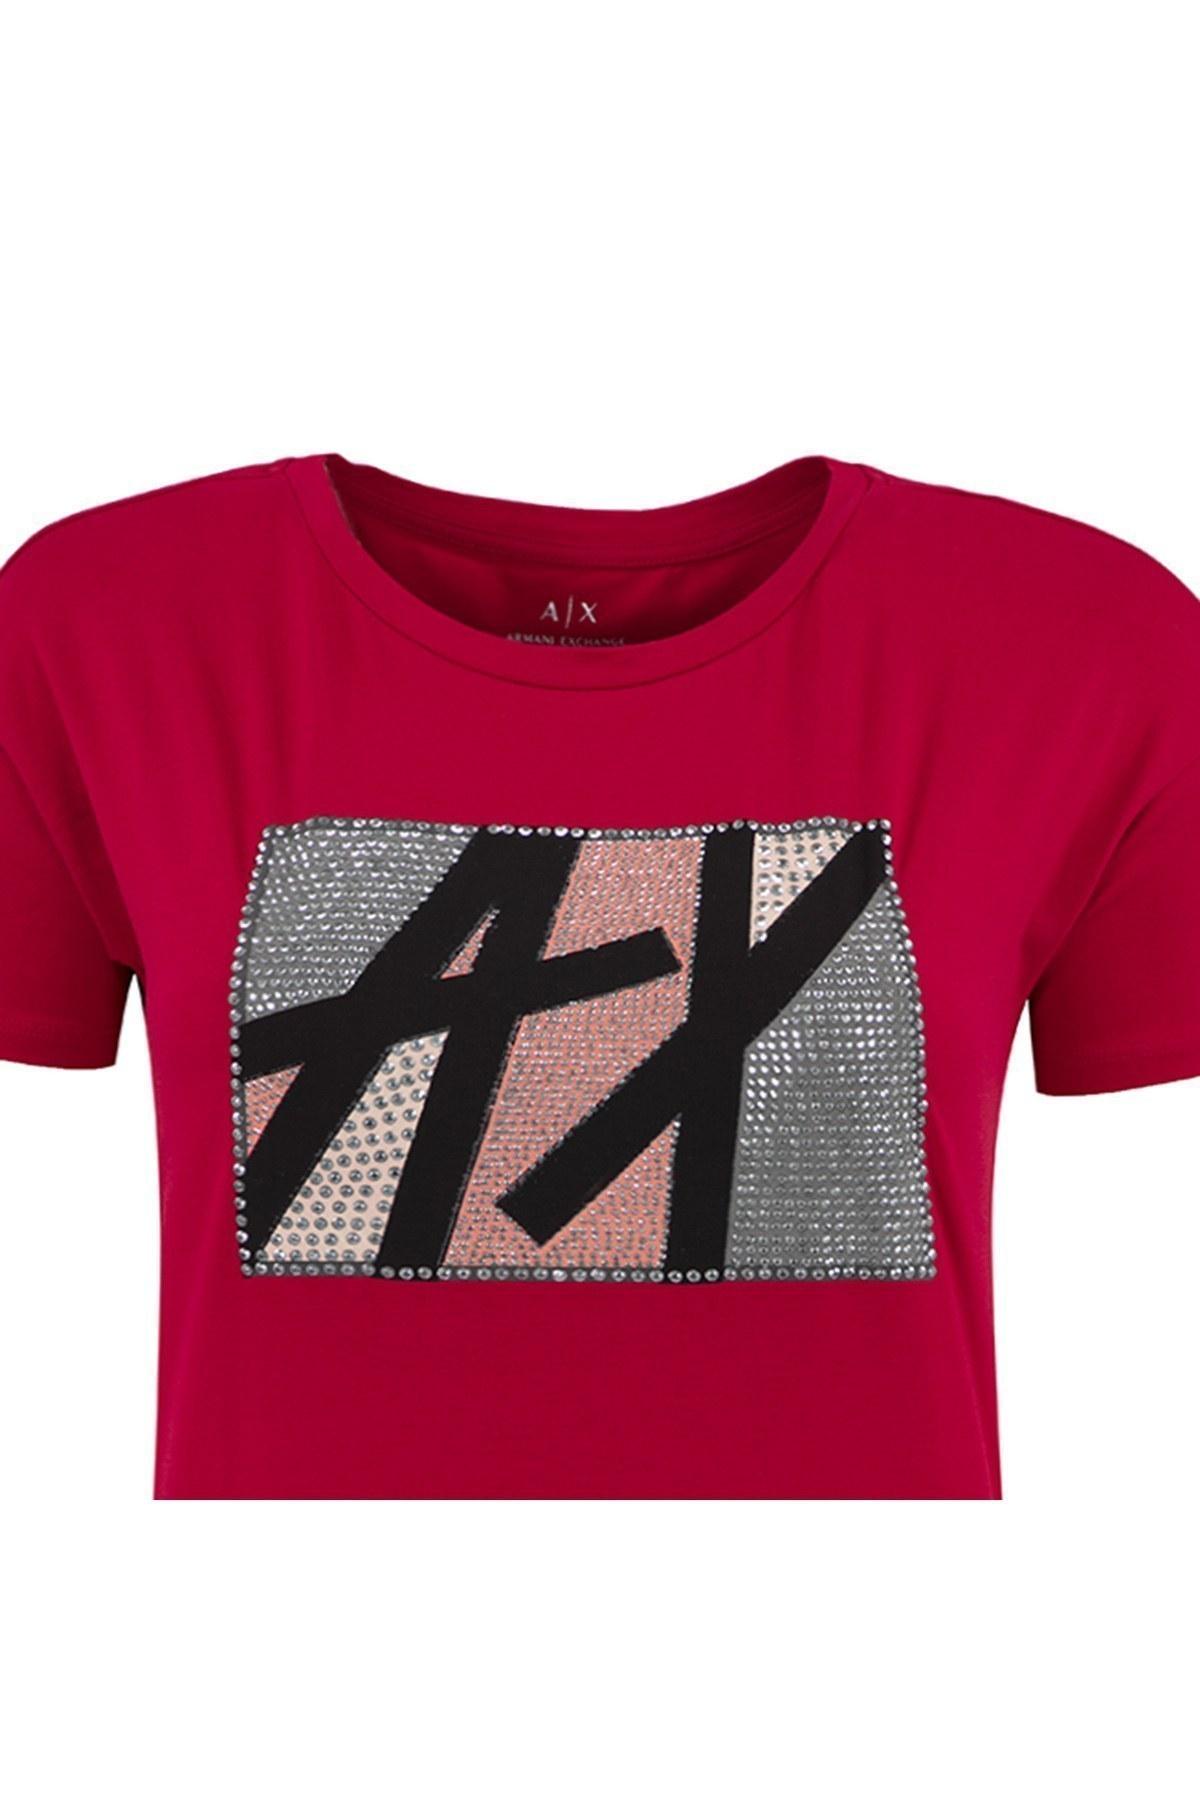 ARMANI EXCHANGE T SHIRT Bayan T Shirt 6ZYTAV YJS8Z 1445 KIRMIZI